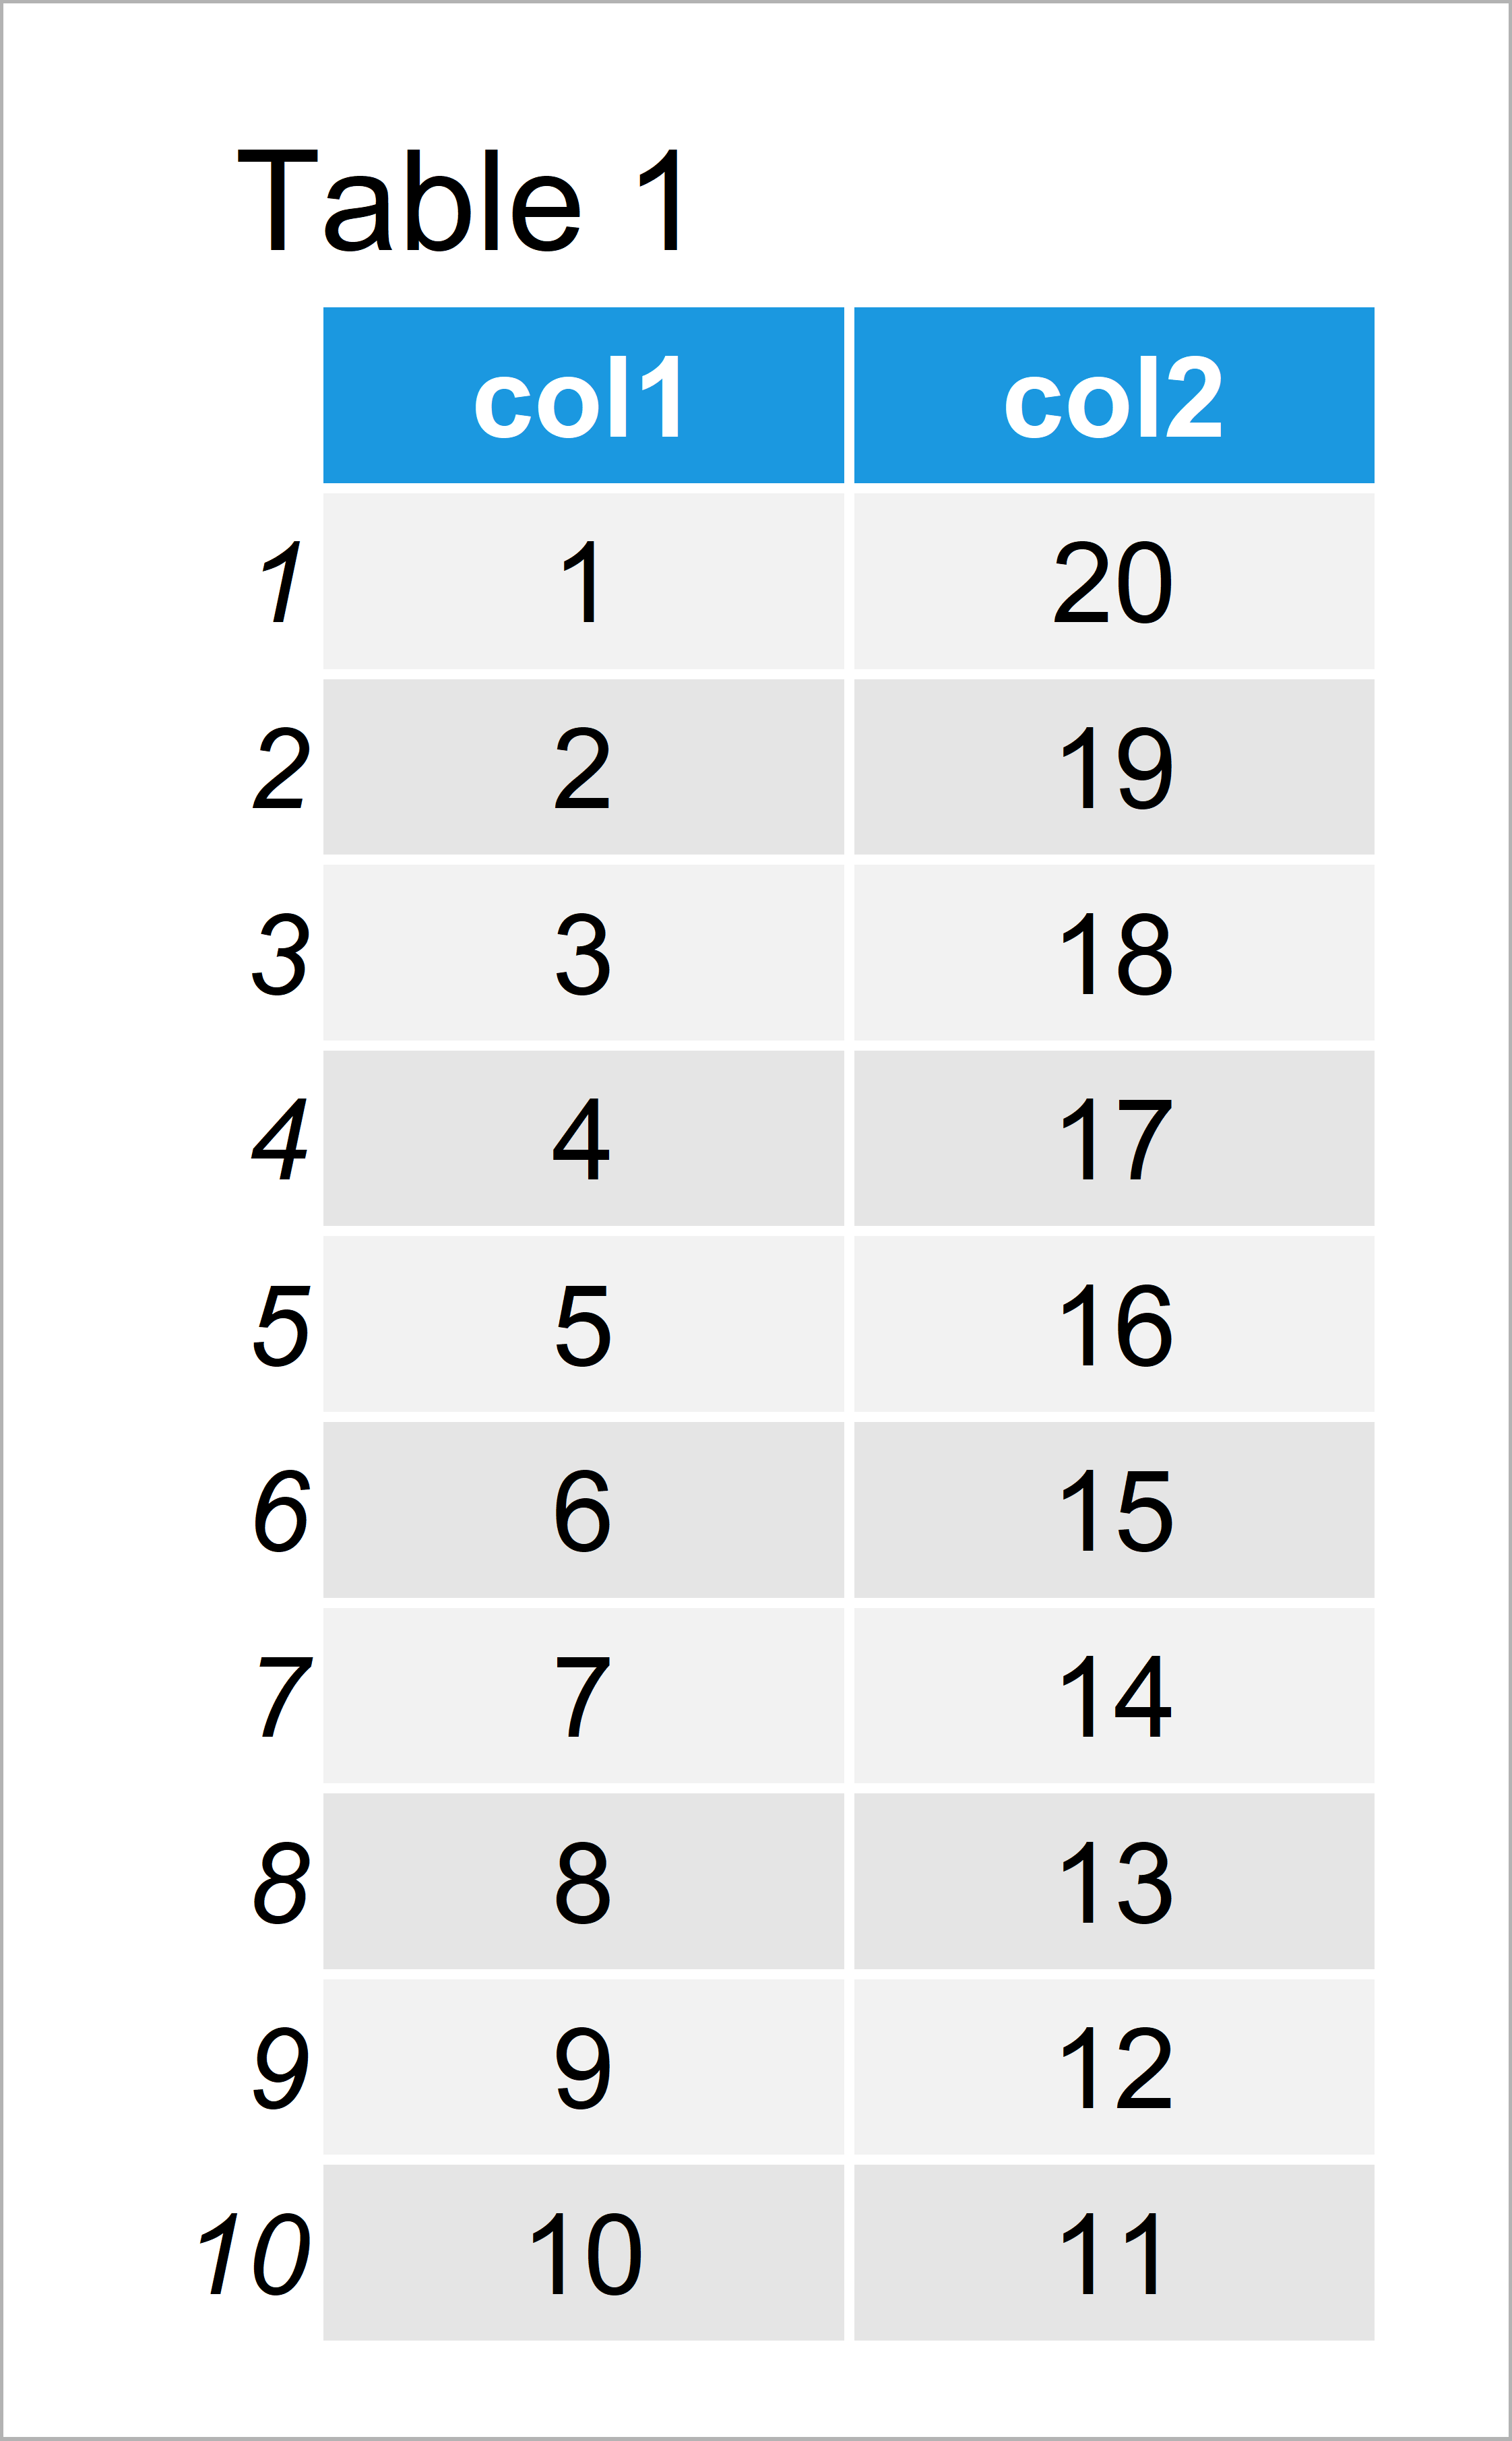 table 1 data frame r ggplot2 error geom_point requires missing aesthetics